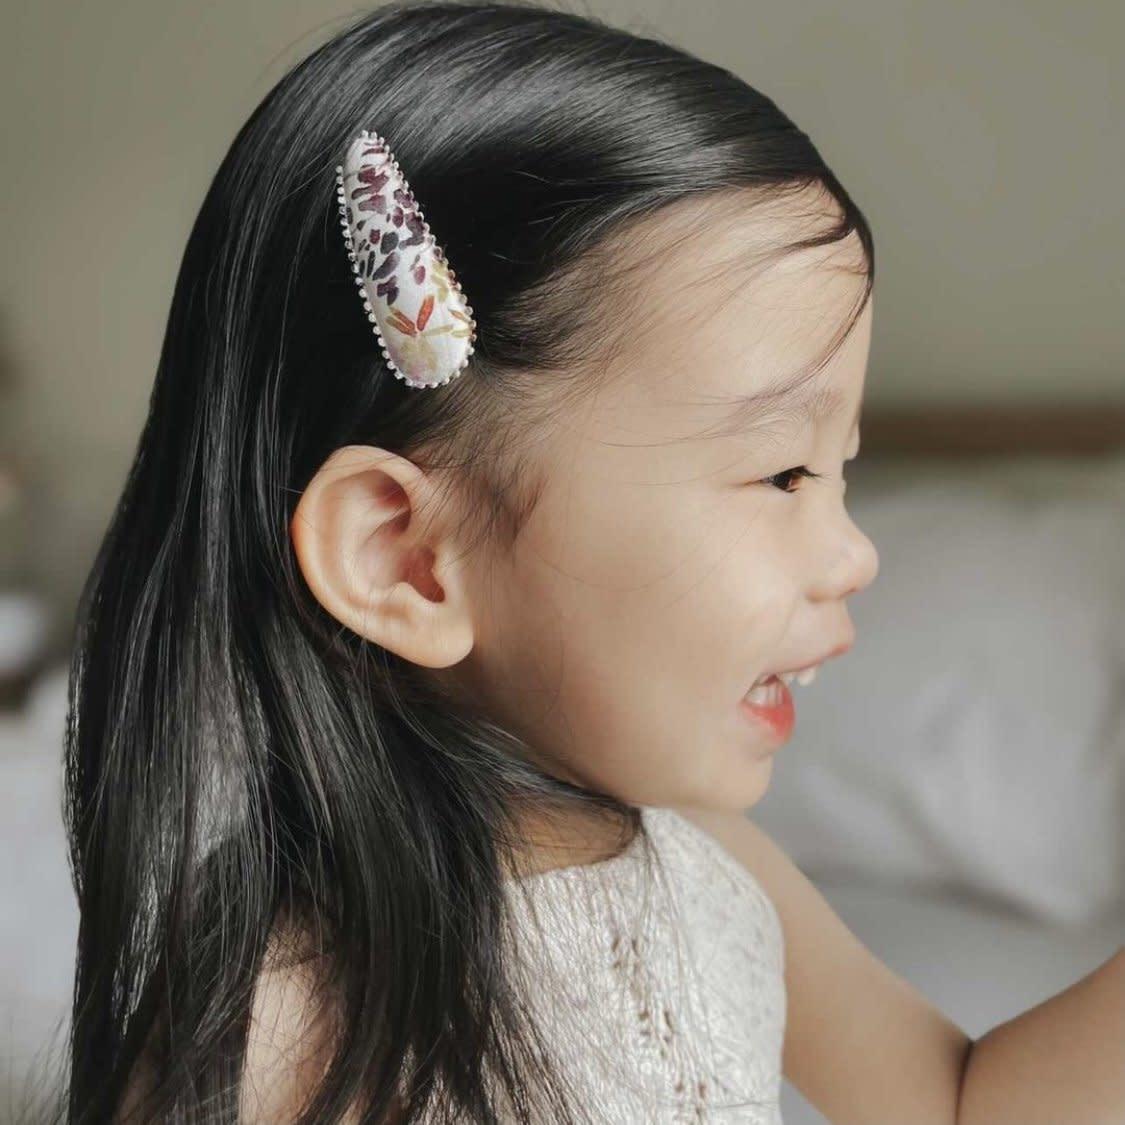 Josie Joan's Hair Clips Stella